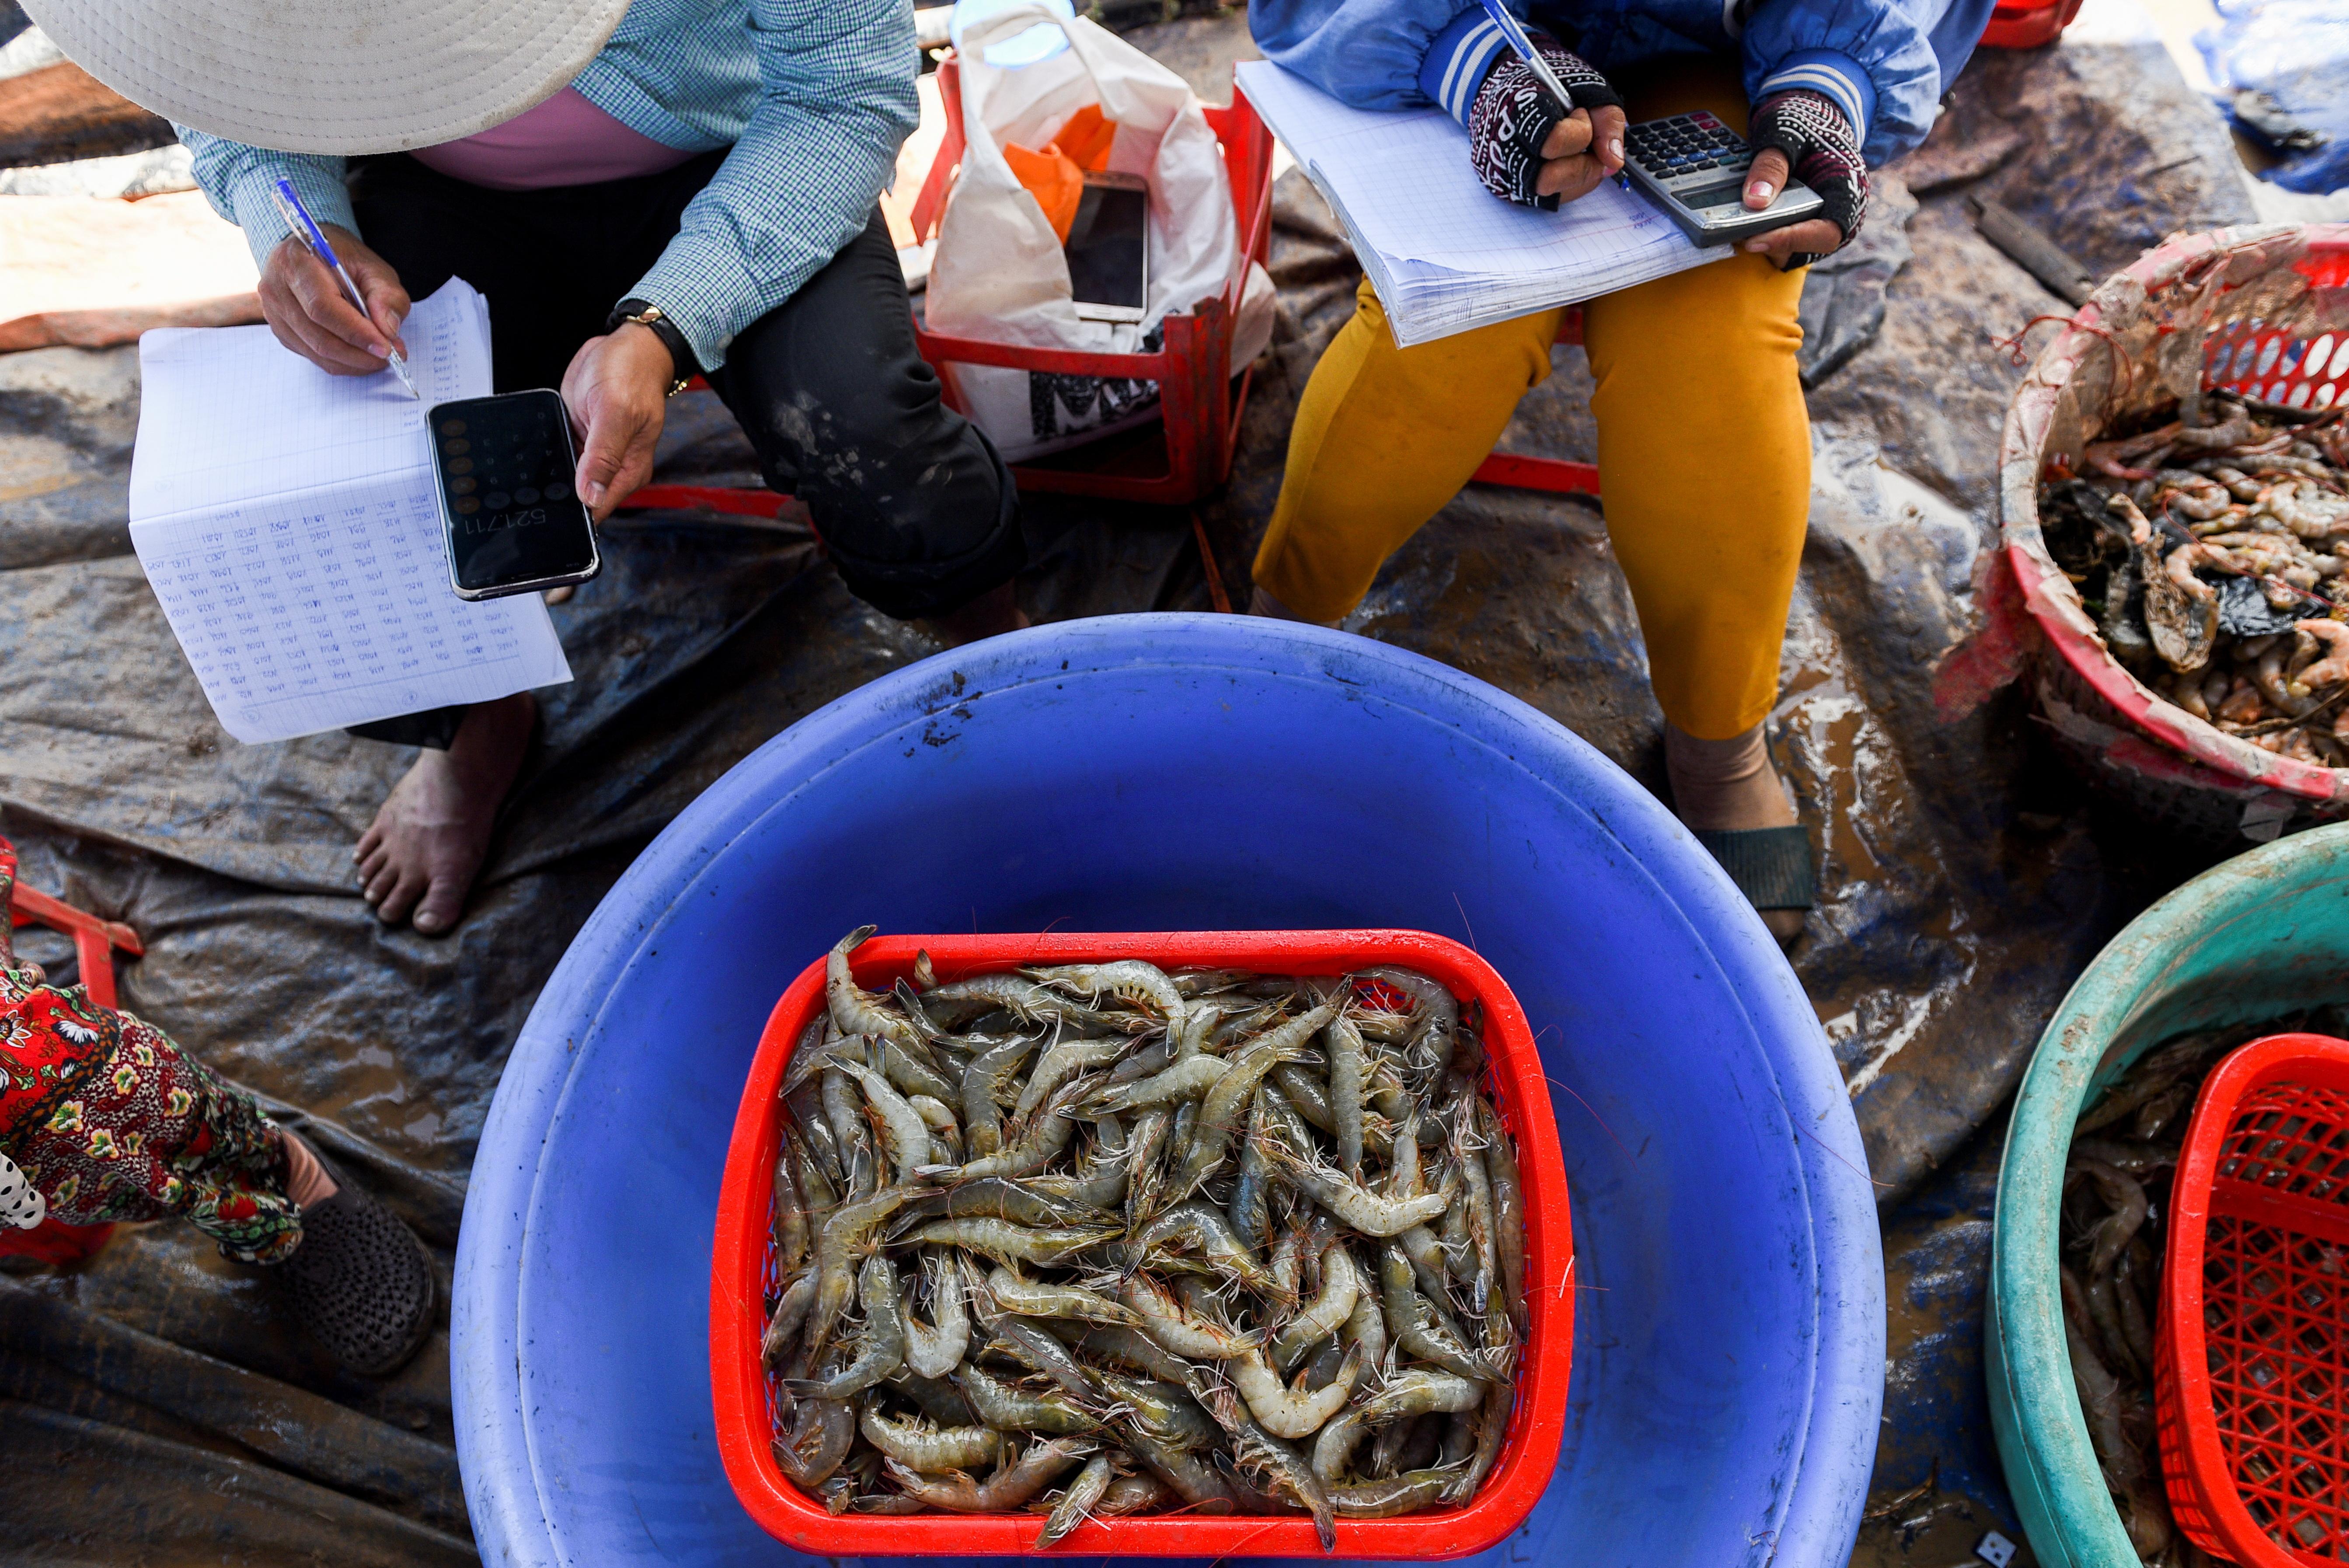 Shrimp farmers weigh harvested shrimps in Soc Trang province, Vietnam, April 27, 2021.  REUTERS/Thanh Hue